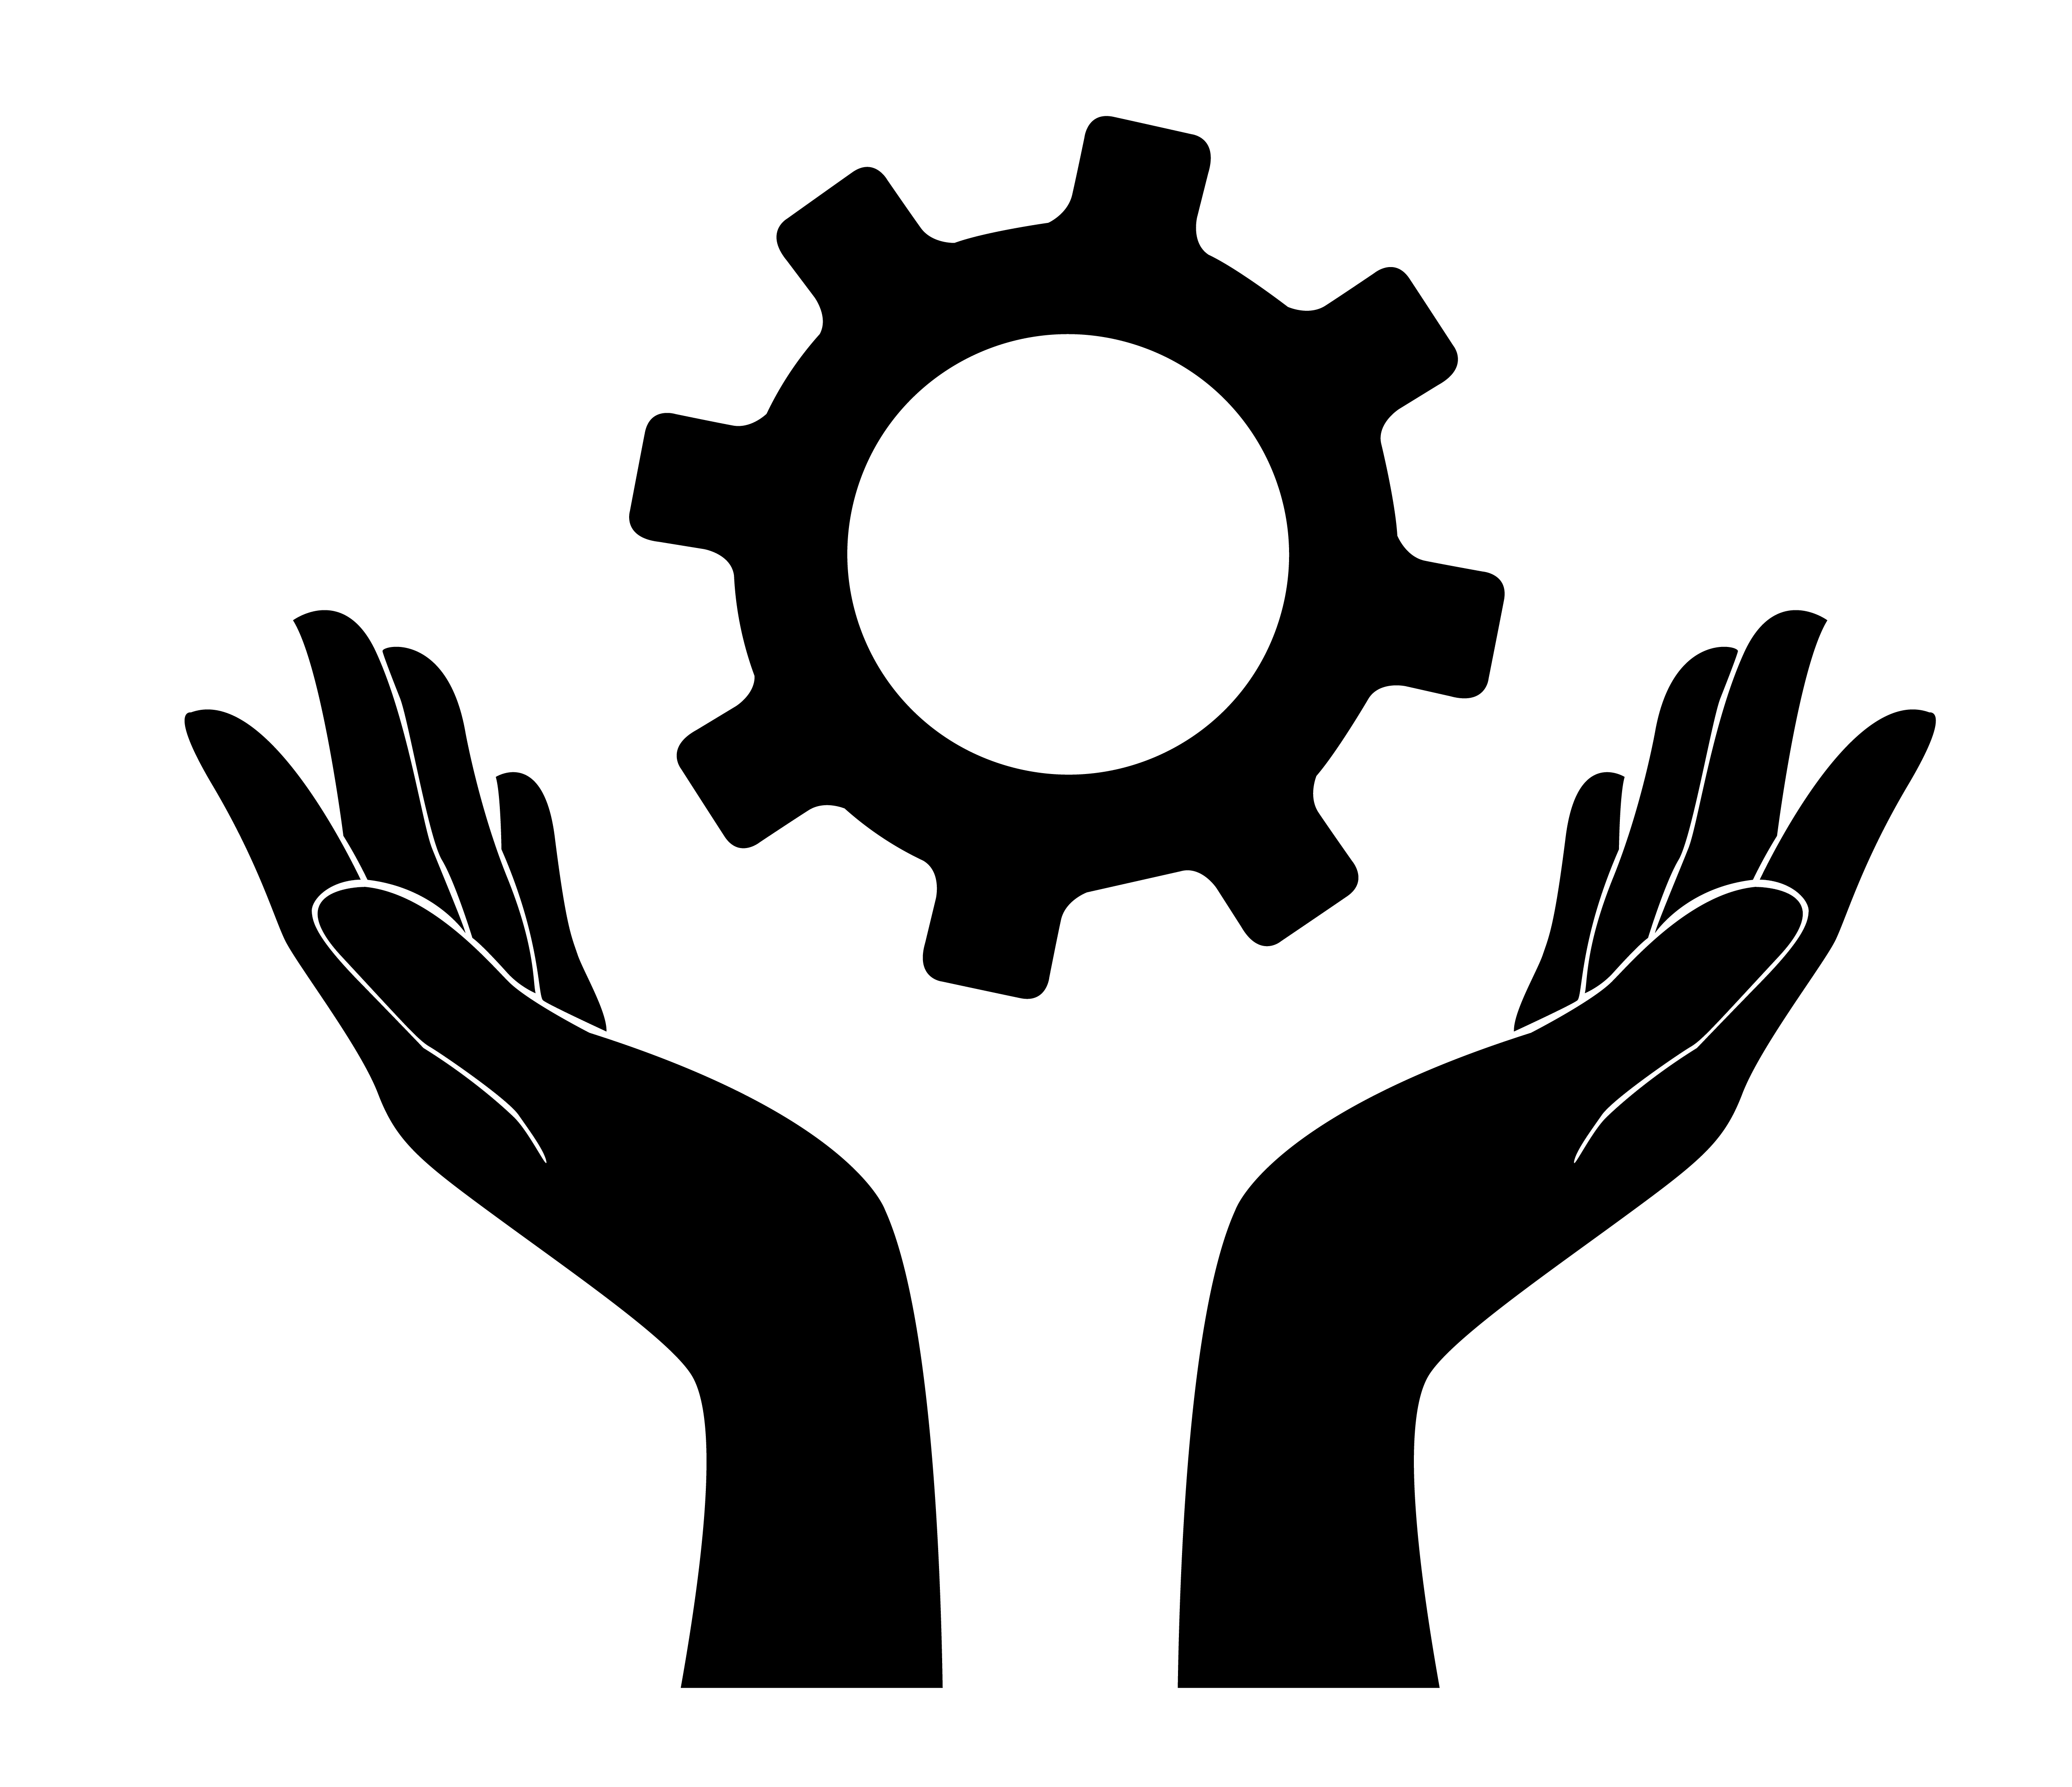 hand holding gear , engineer symbol - Download Free ... | 4647 x 4008 jpeg 576kB